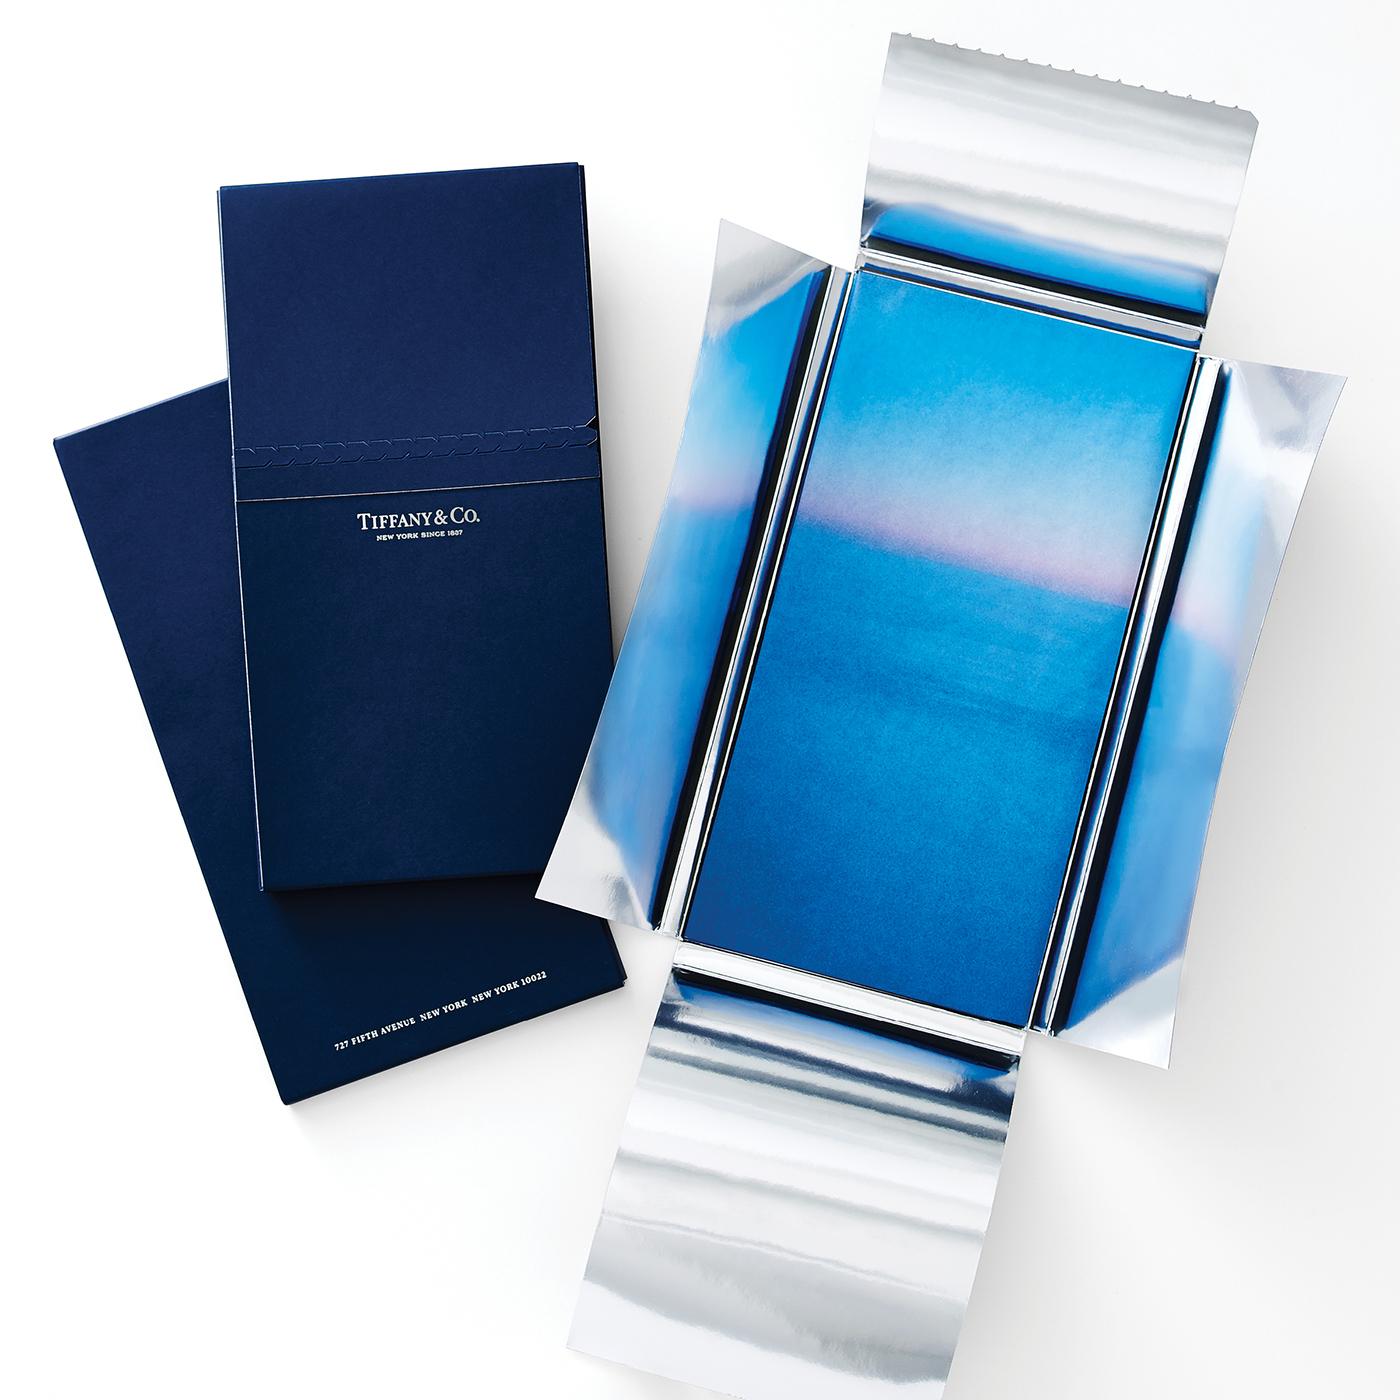 Tiffany 2015 Blue Book Party Invitation On Behance